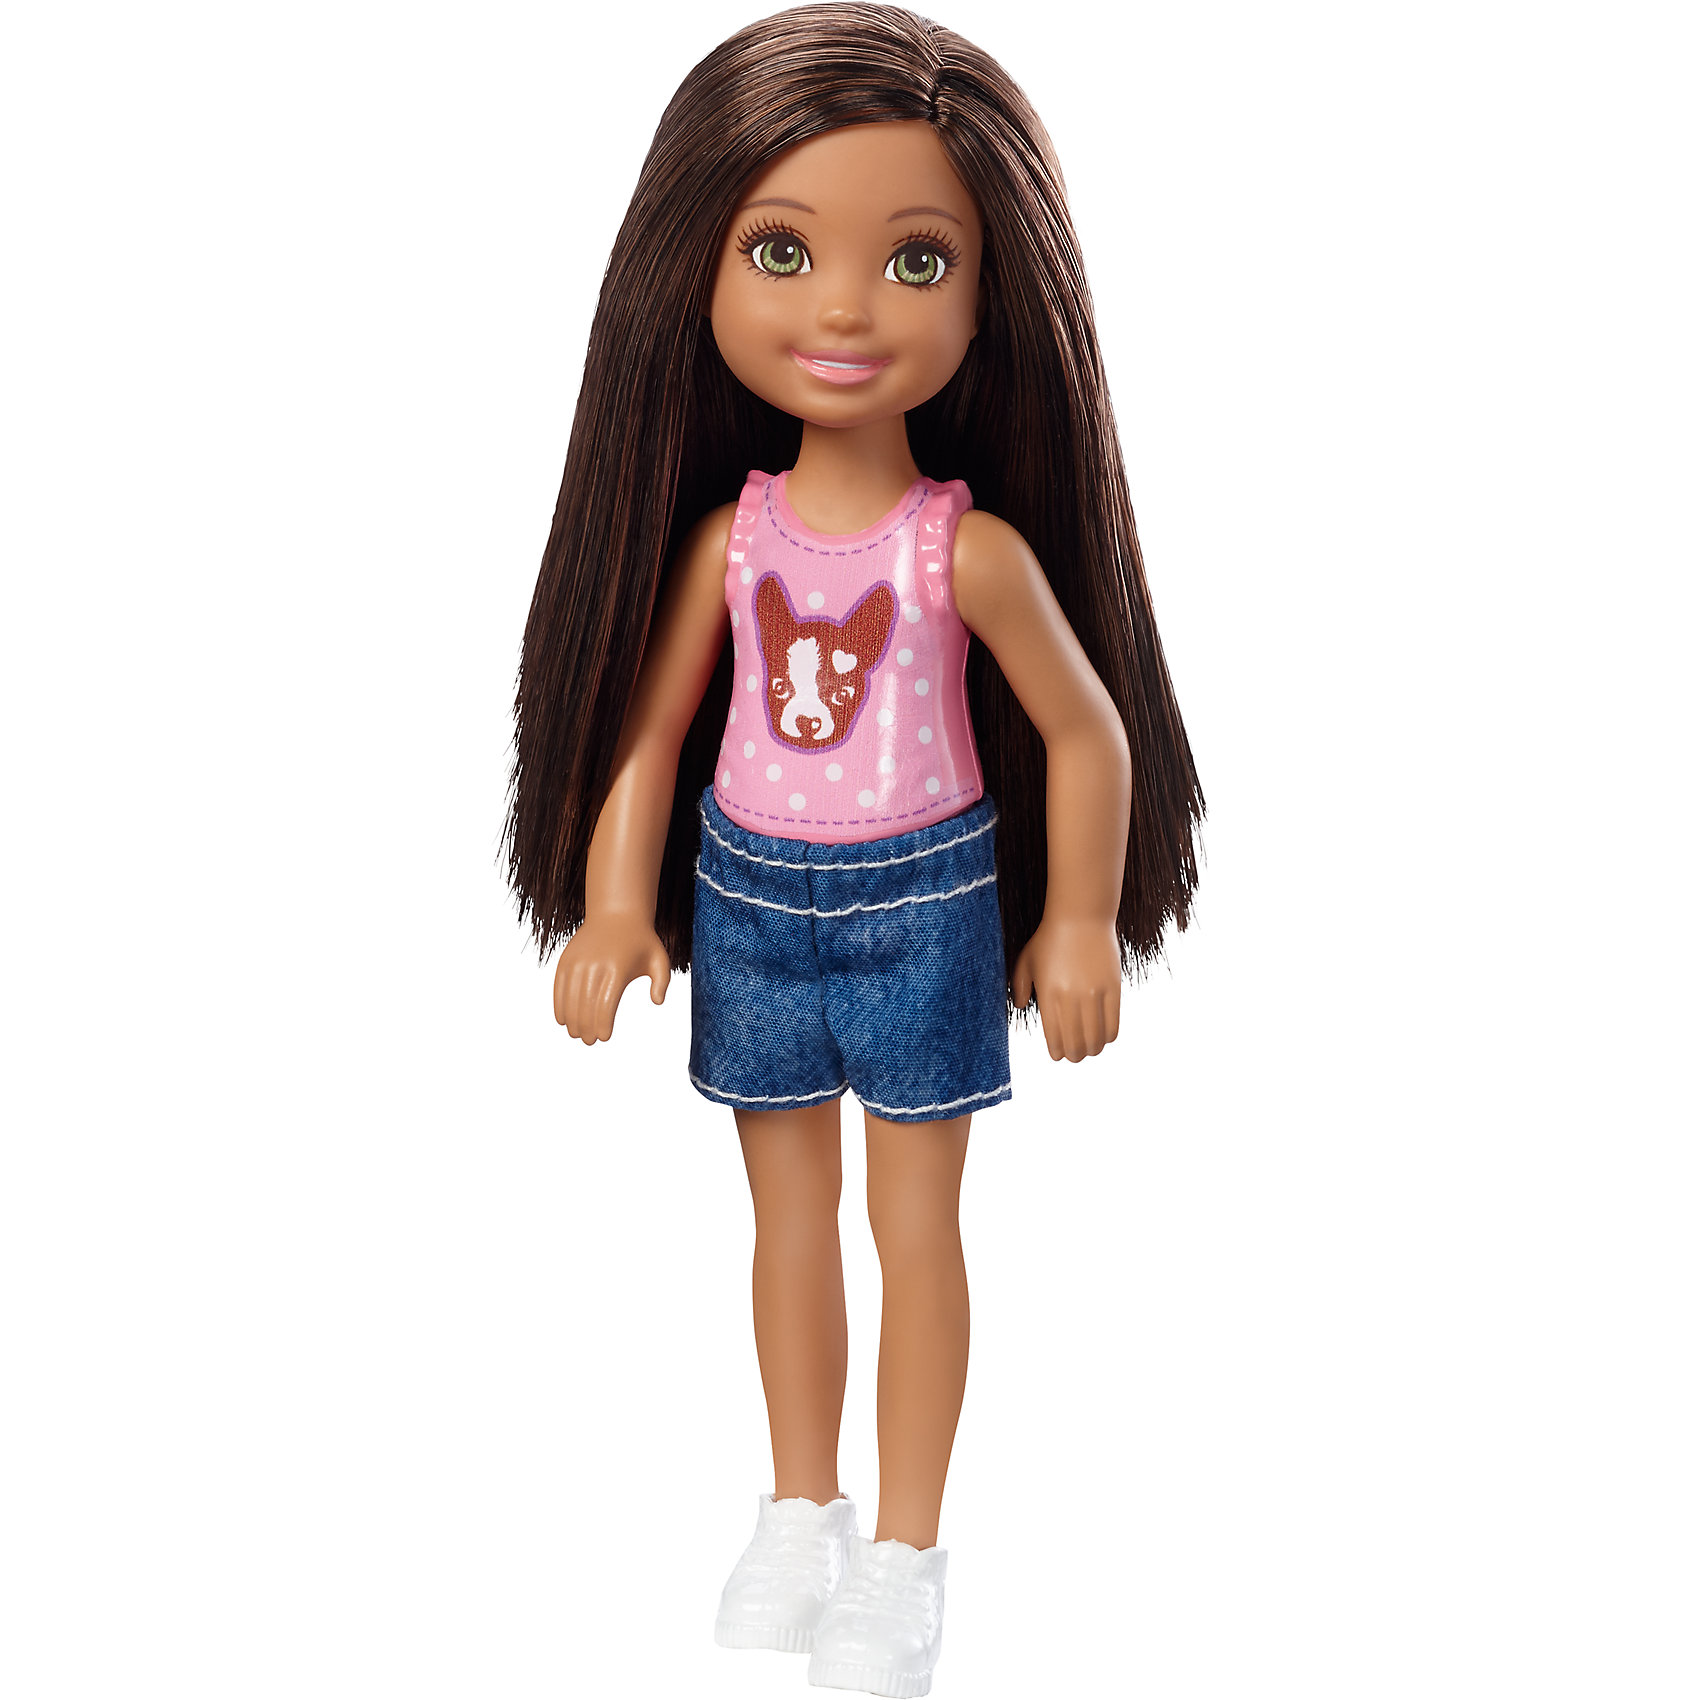 Кукла-Челси, Barbie<br><br>Ширина мм: 90<br>Глубина мм: 40<br>Высота мм: 160<br>Вес г: 73<br>Возраст от месяцев: 36<br>Возраст до месяцев: 120<br>Пол: Женский<br>Возраст: Детский<br>SKU: 5389673